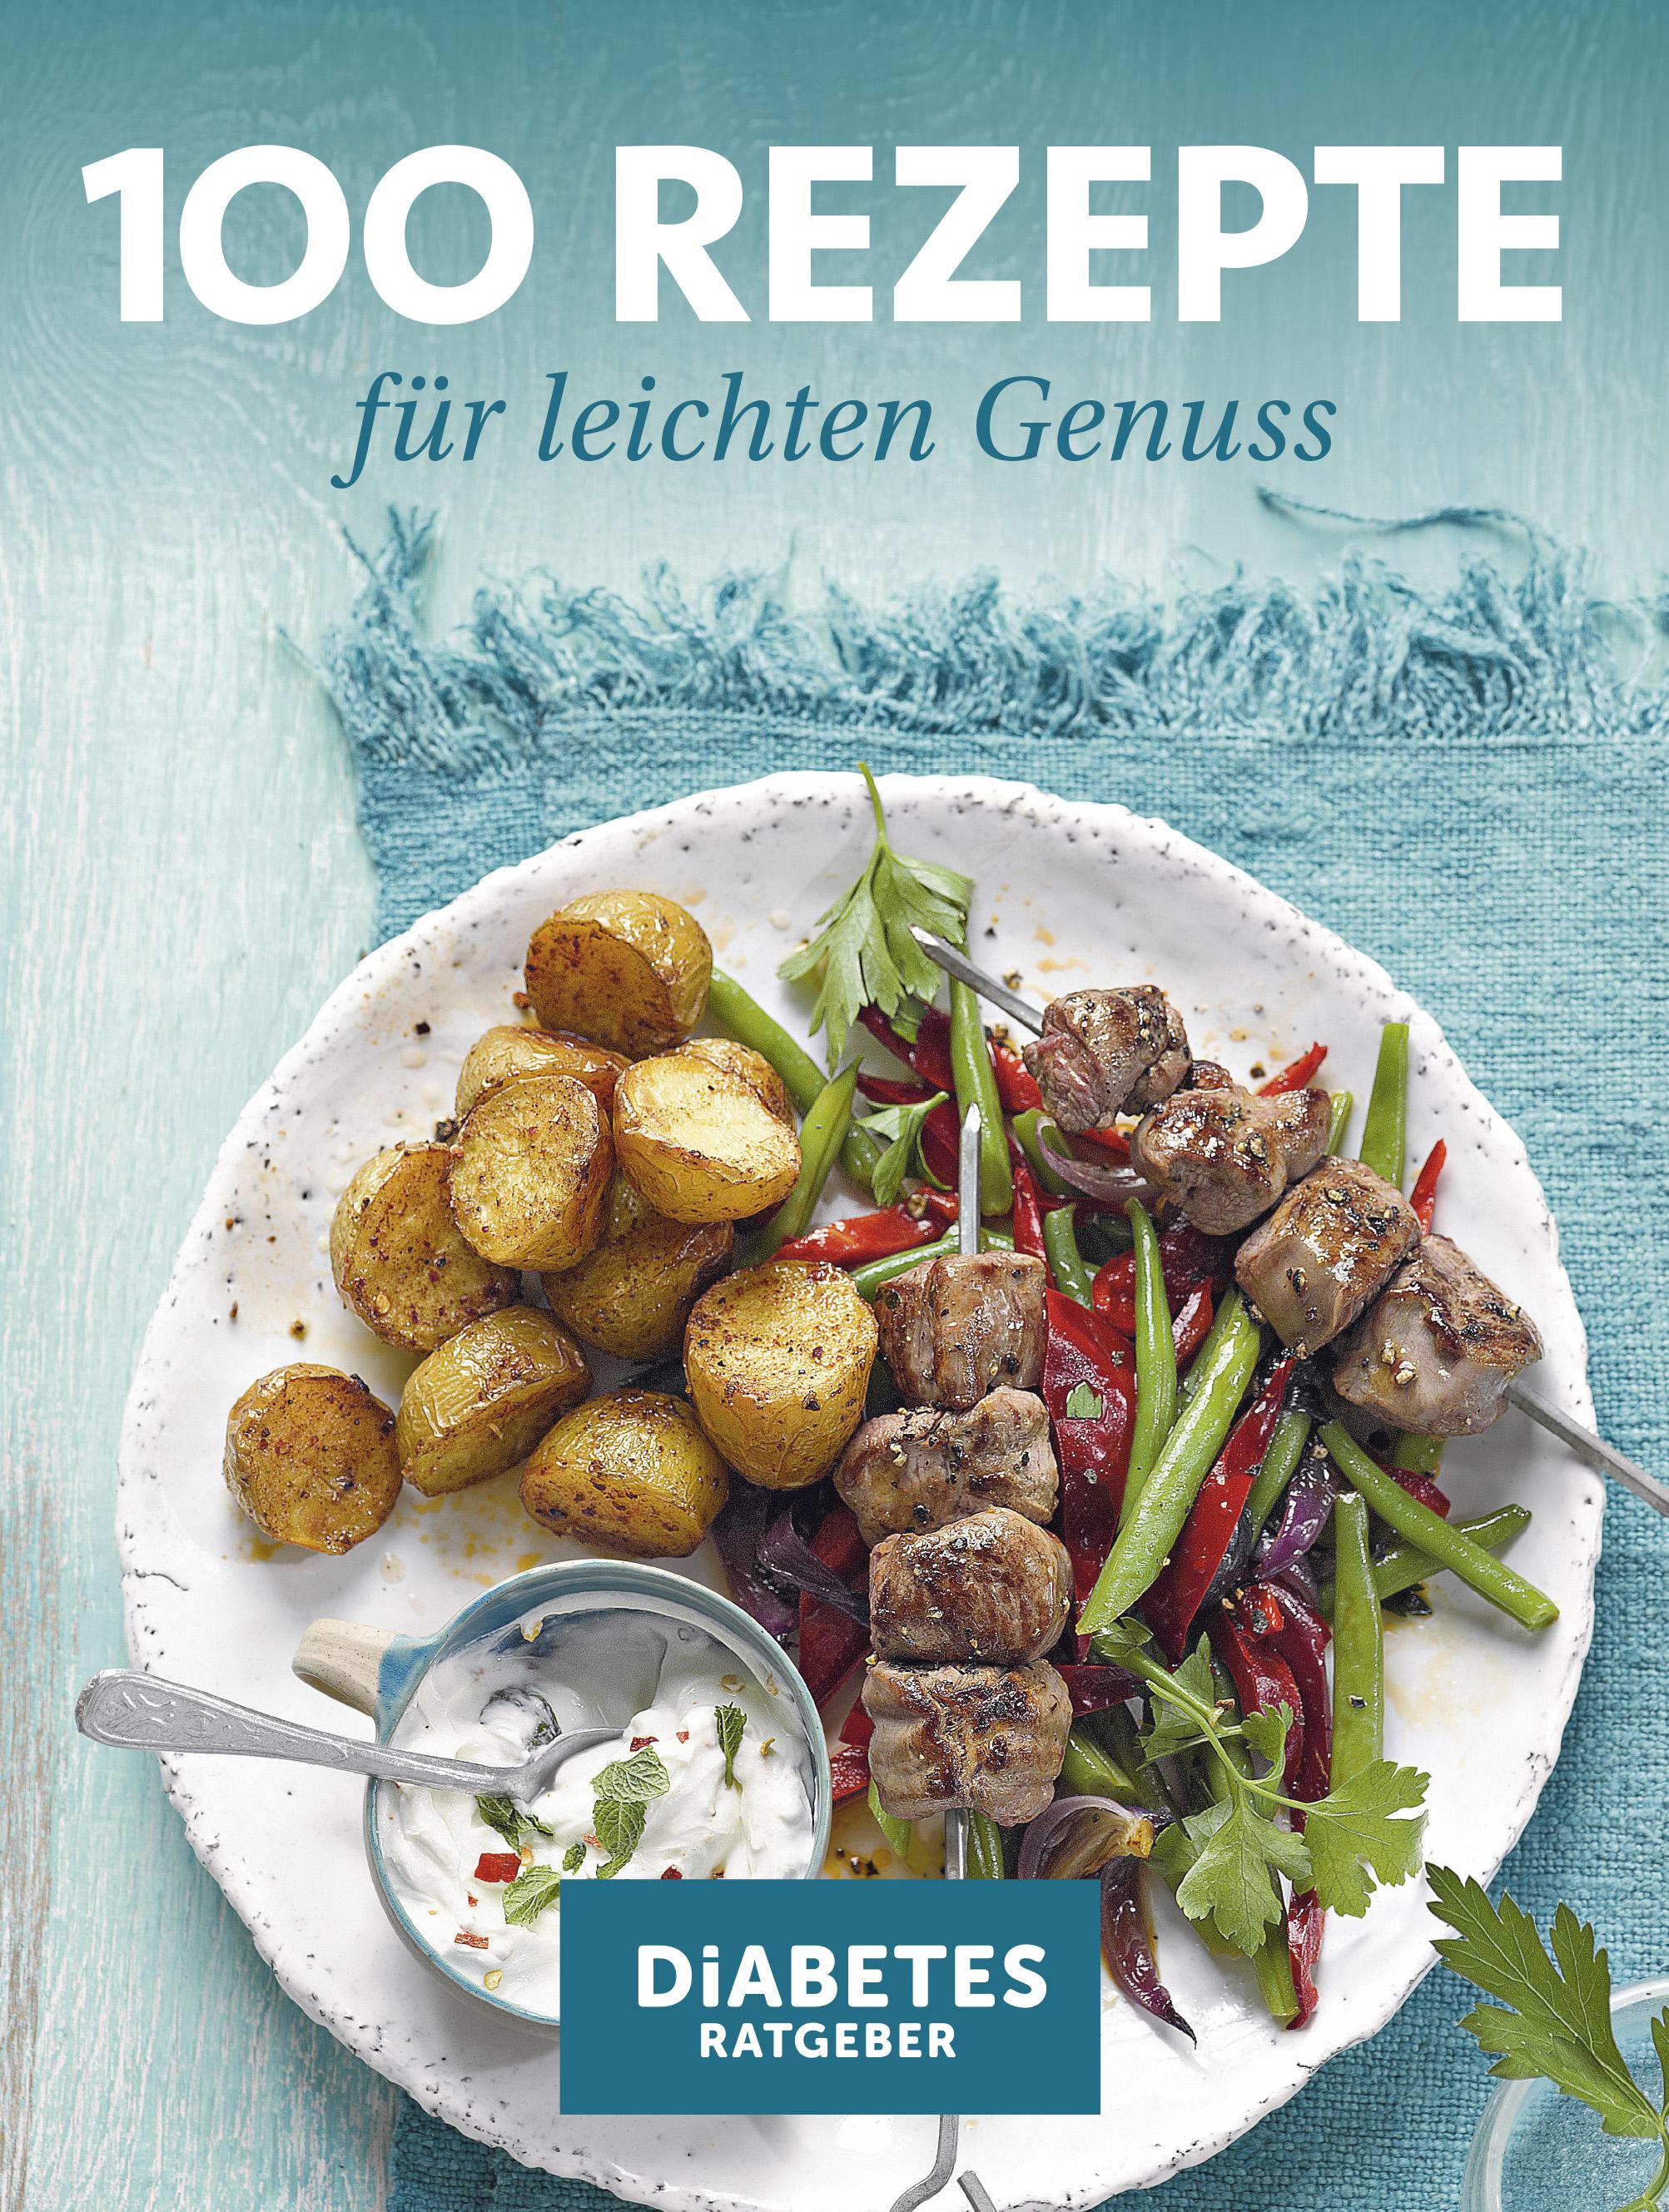 Beautiful Leichte Mediterrane Küche Rezepte Images - Amazing Home ...